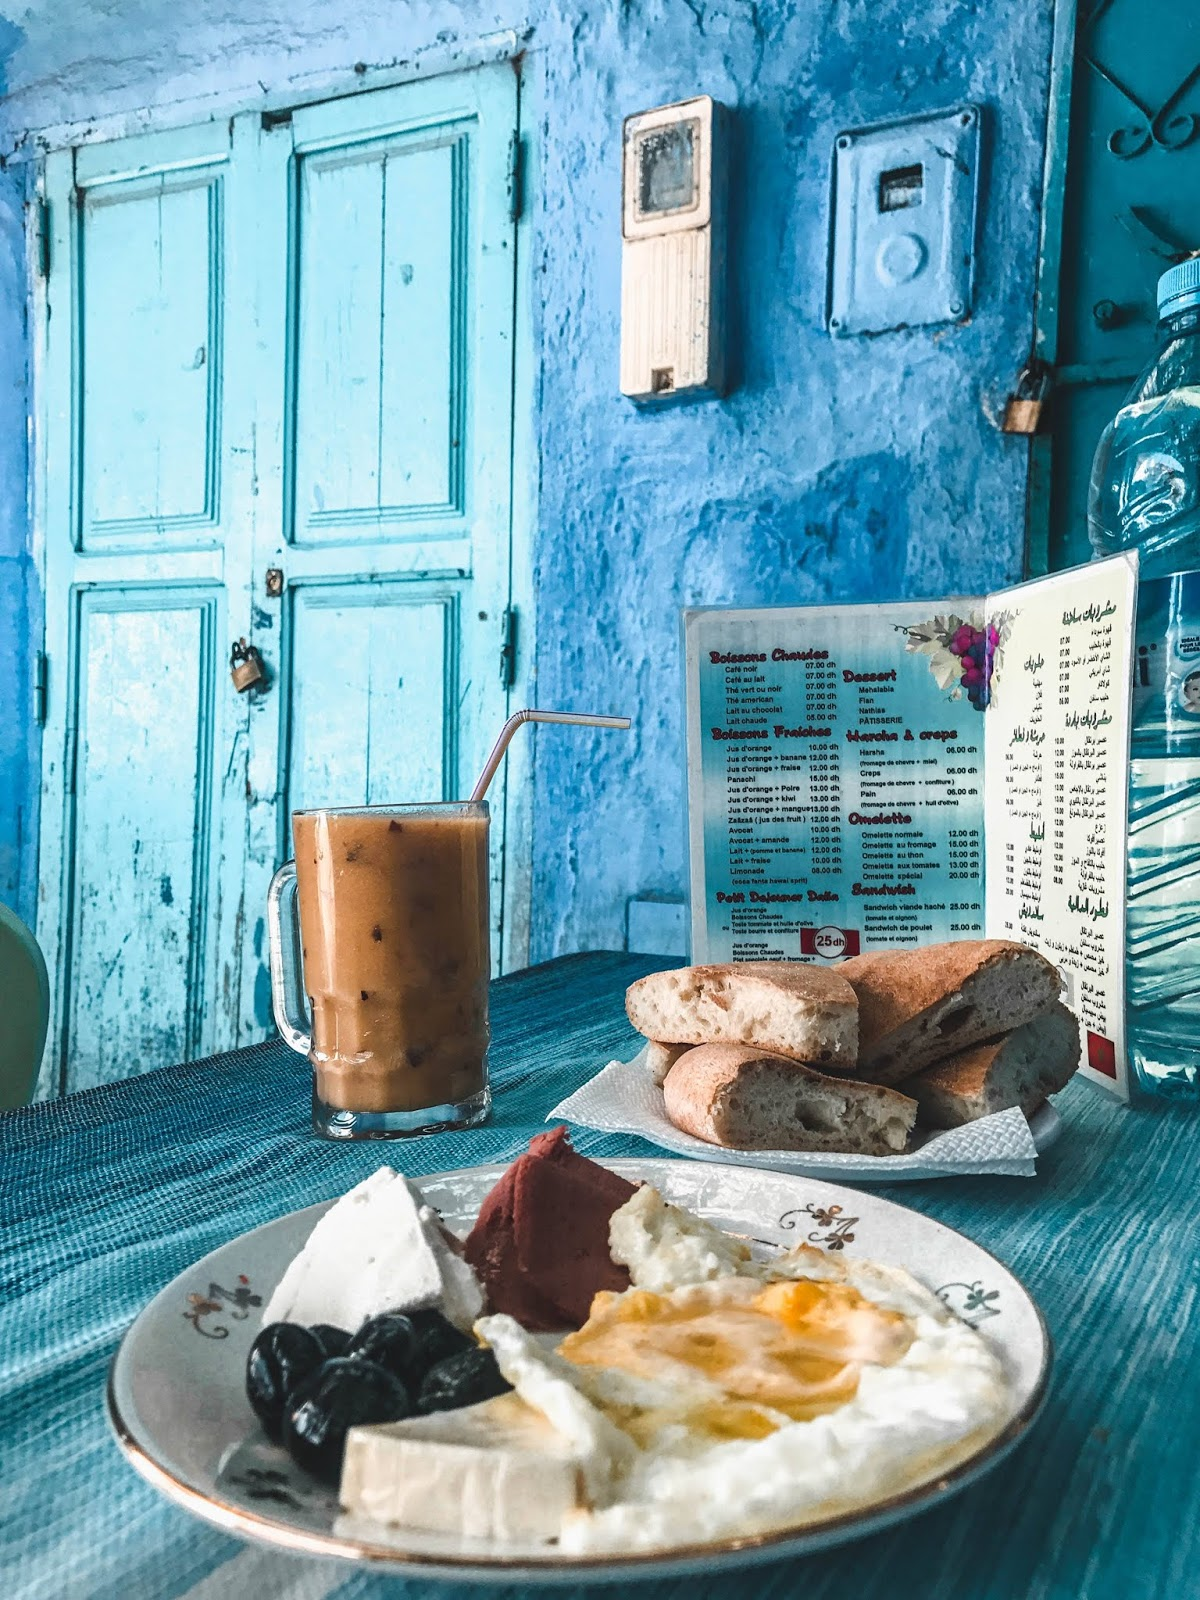 Chefchaouen Morocco Breakfast